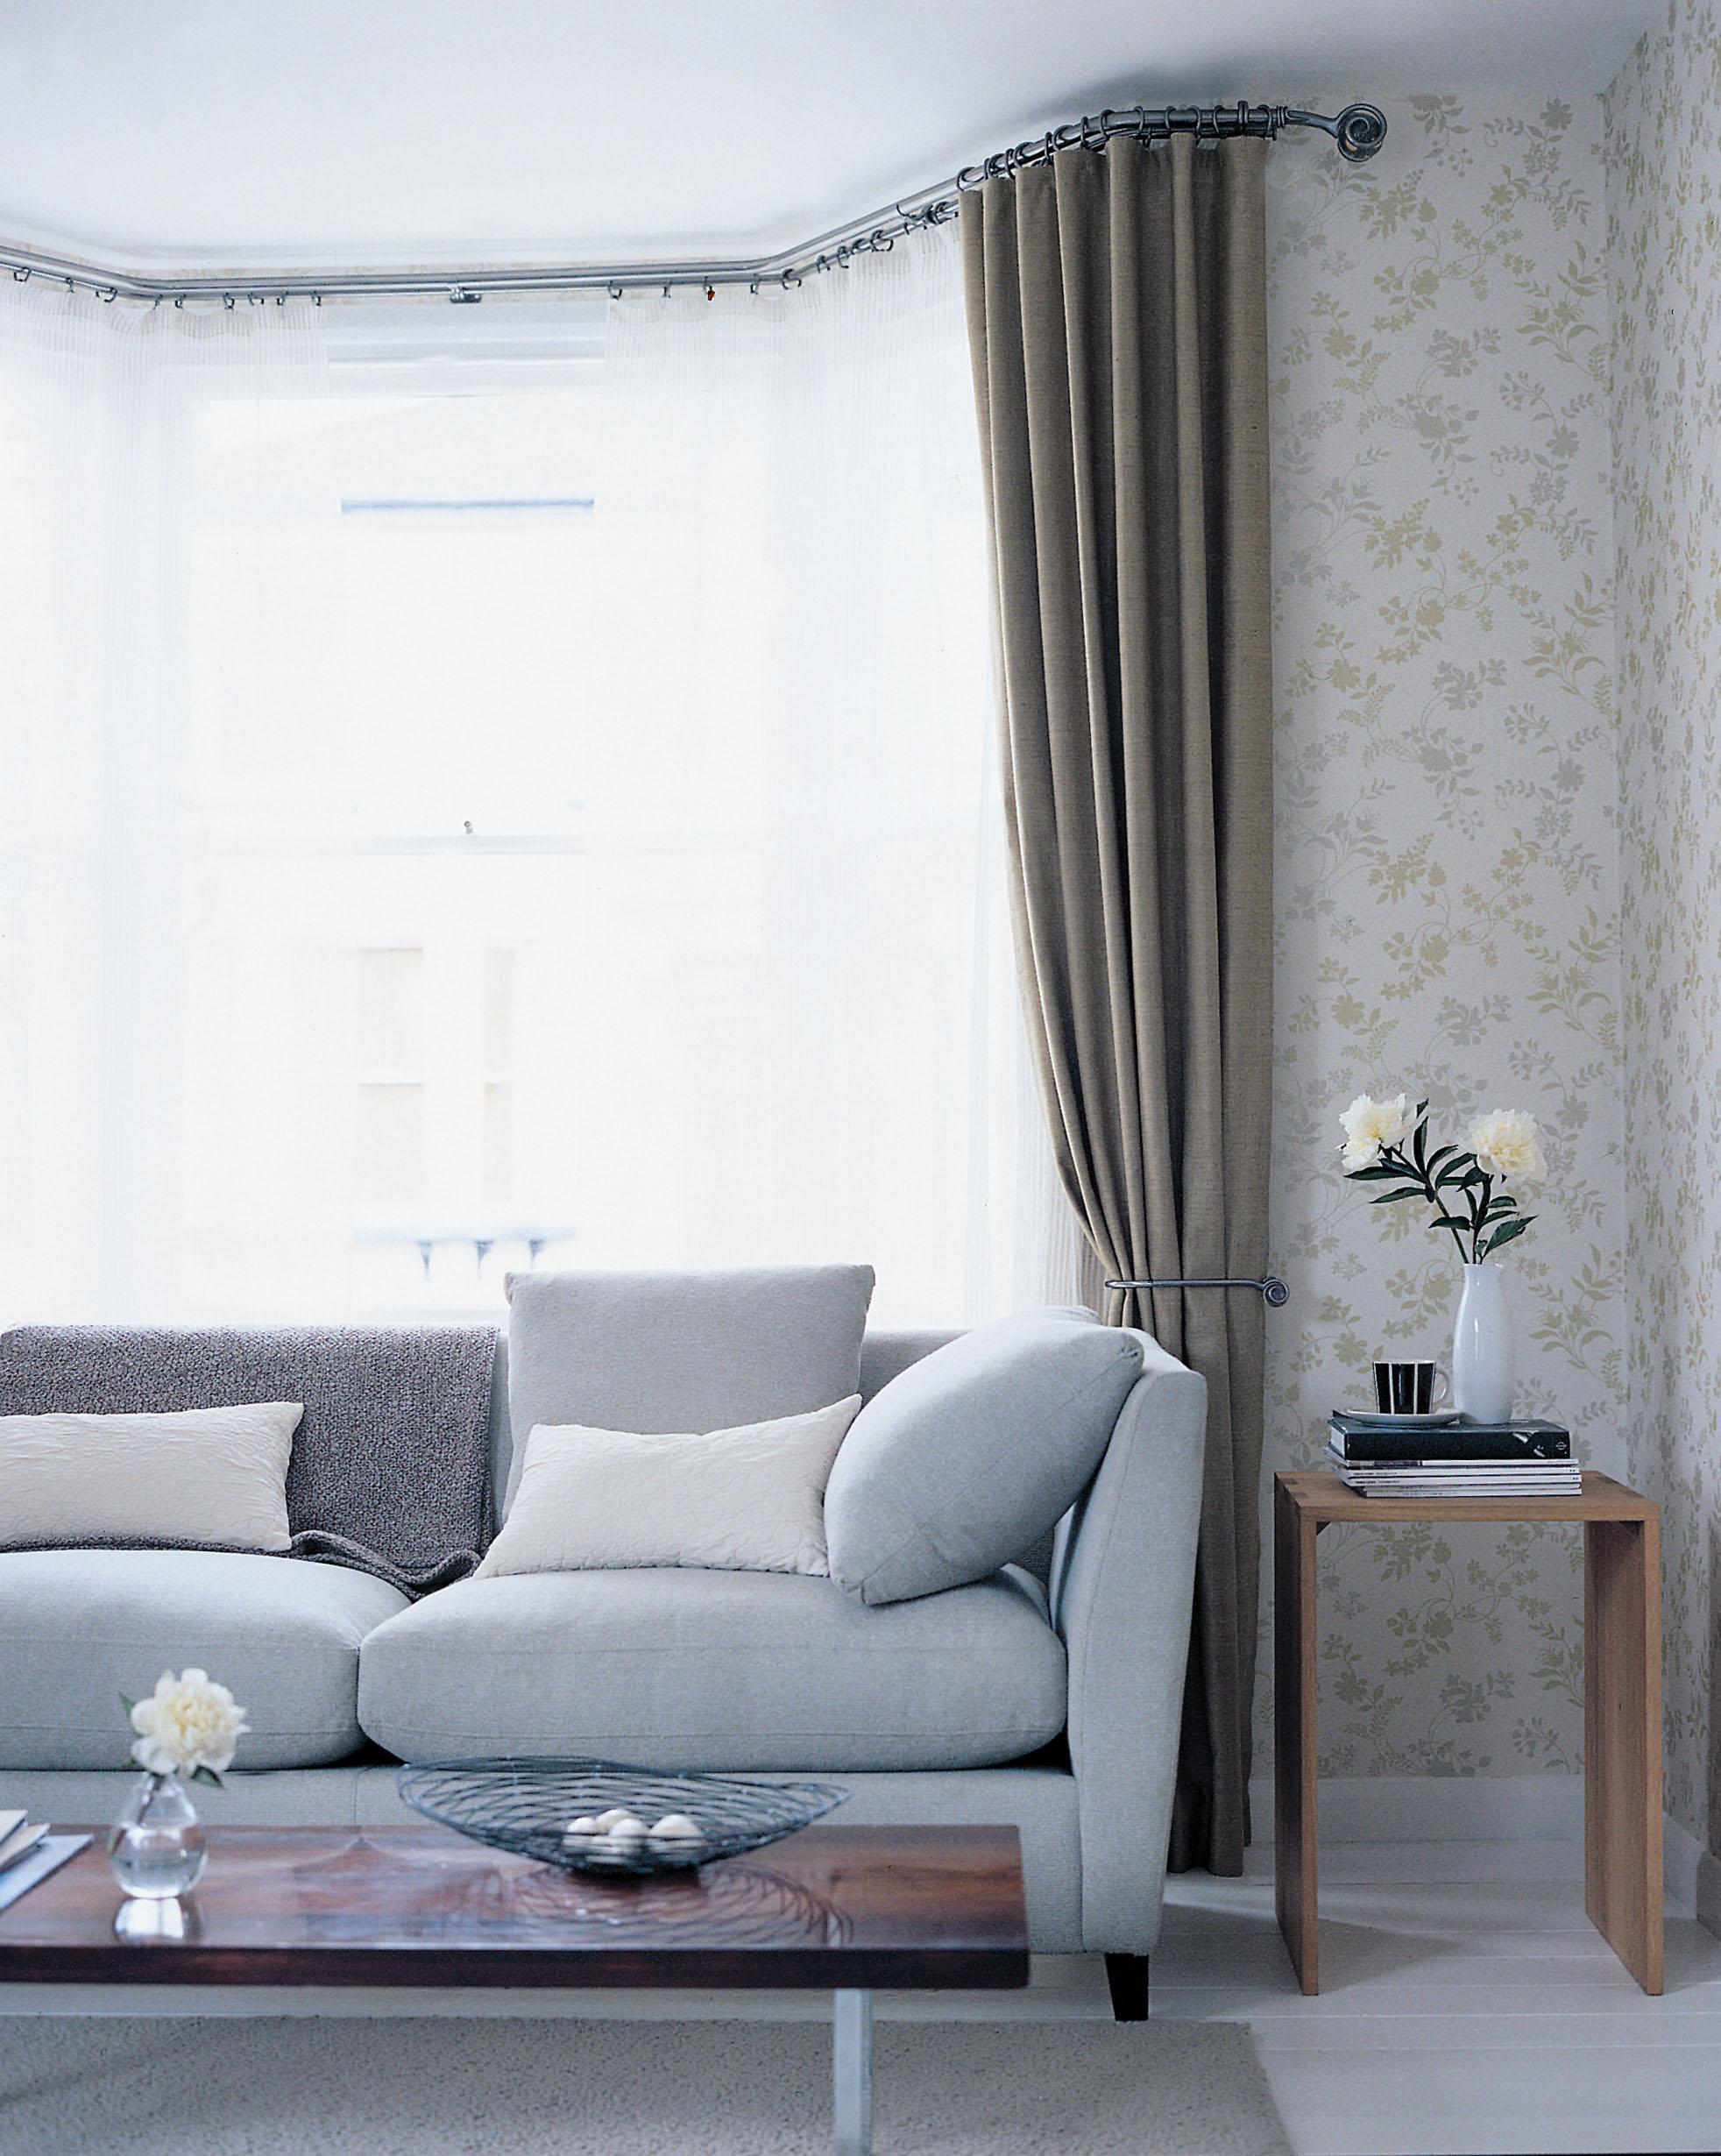 Cute 25+ best ideas about Bay Window Curtain Rail on Pinterest   Bay window square bay window curtains